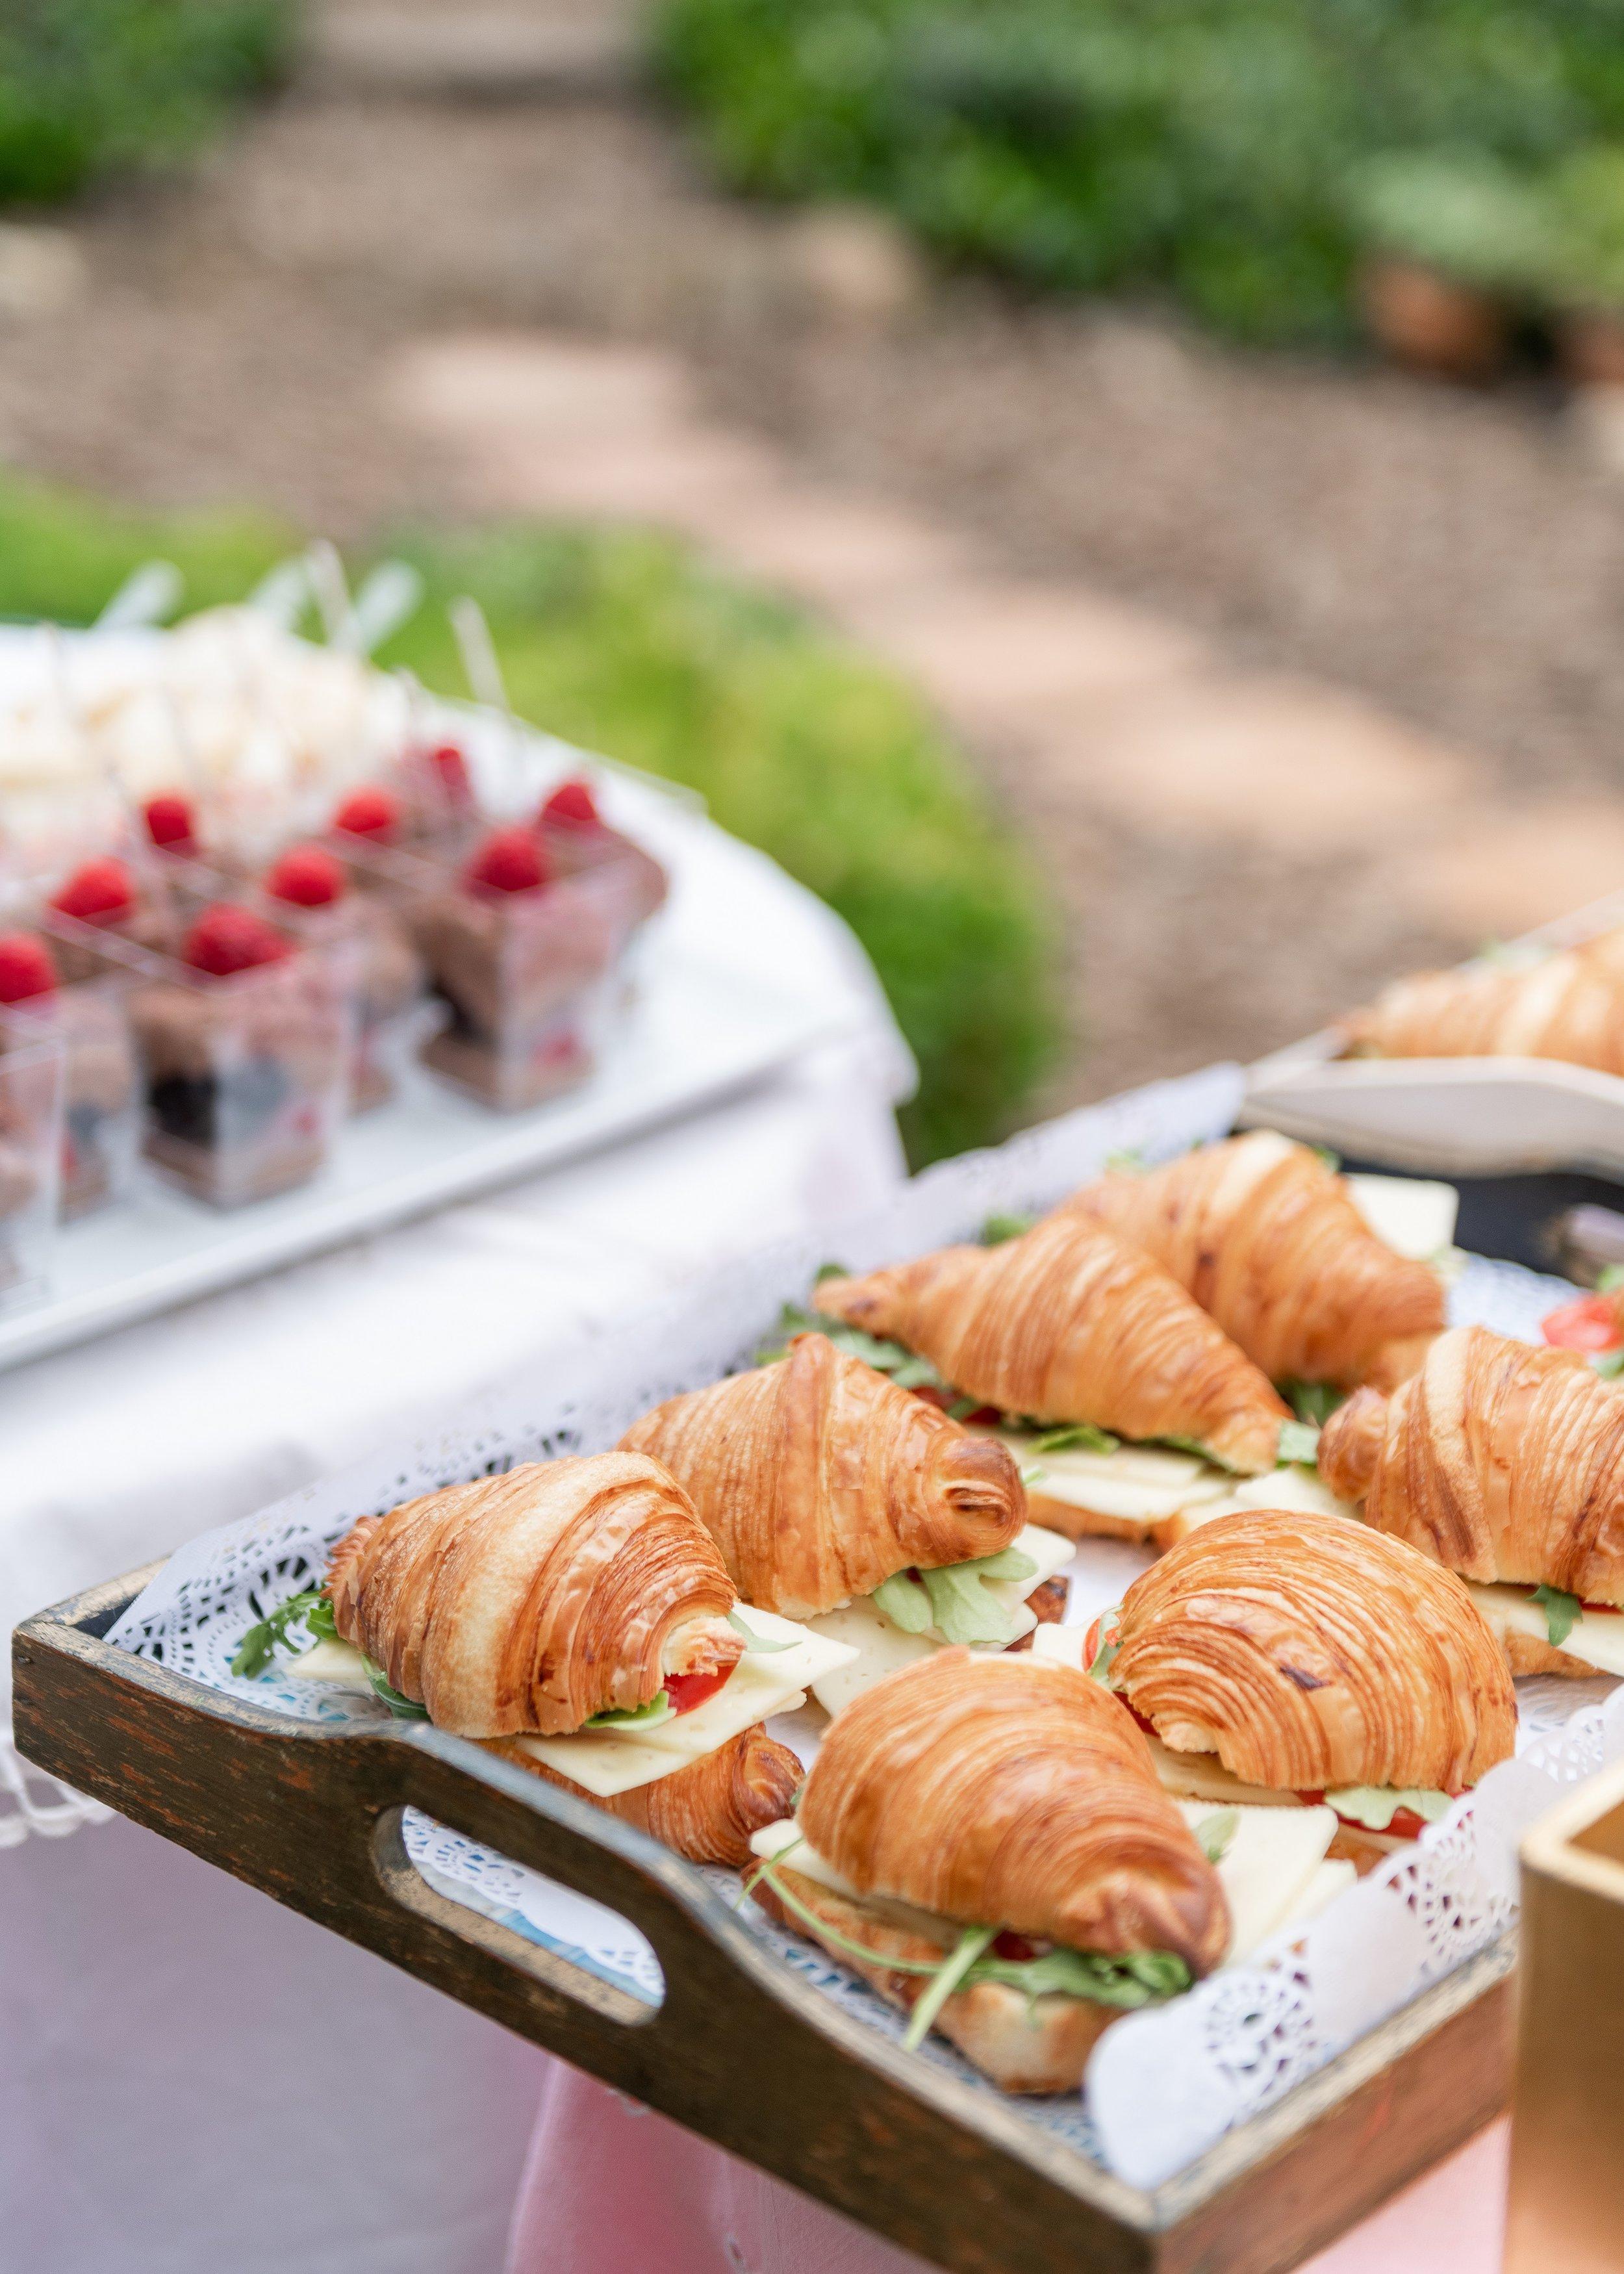 www.santabarbarawedding.com | Willa Kveta Photography | Santa Barbara Classic Weddings | Officiant Event | Sandwiches